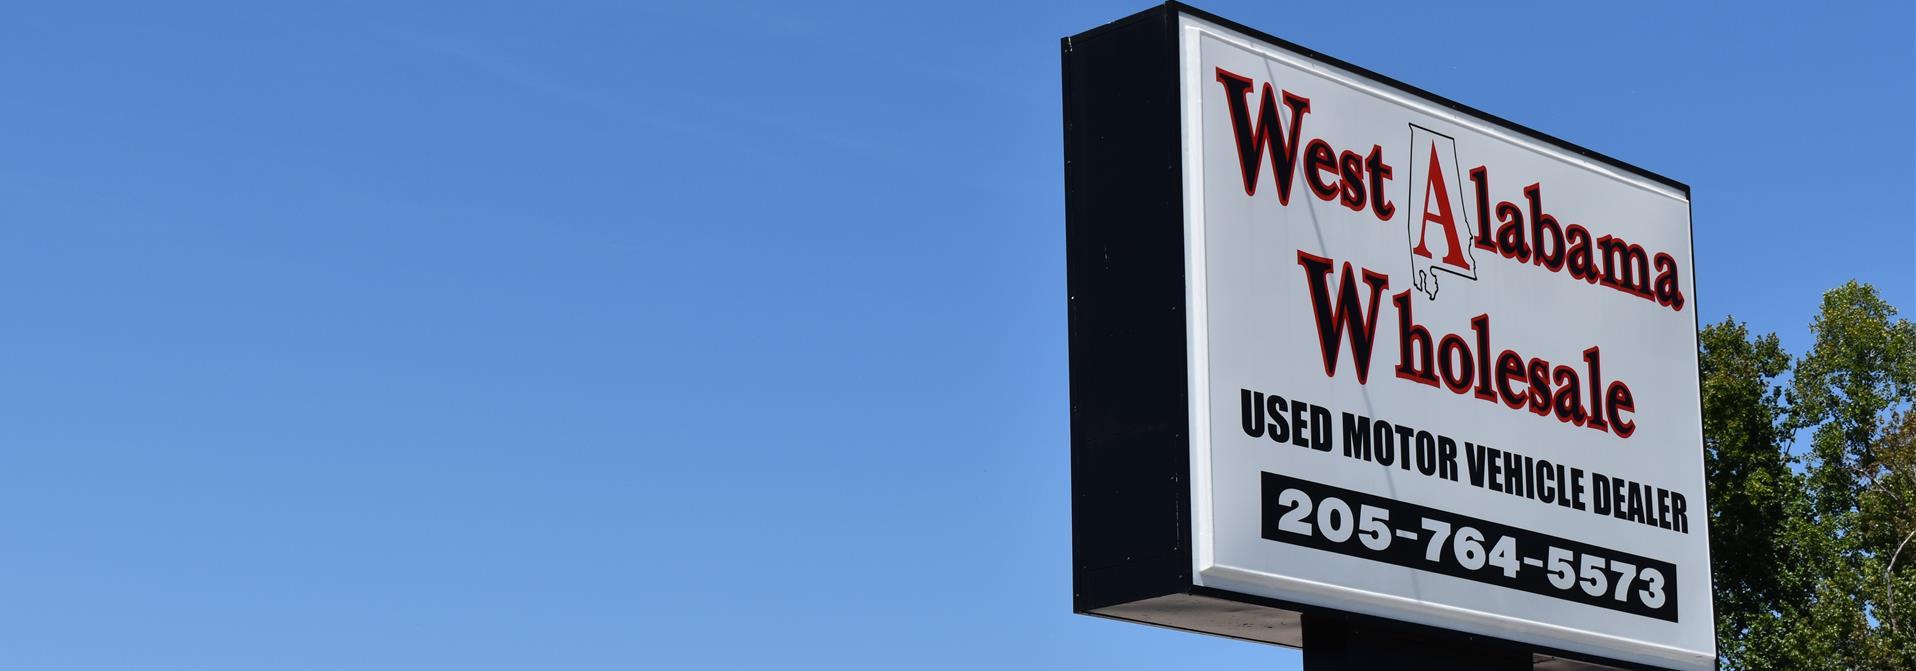 West alabama wholesale tuscaloosa al new used cars trucks sales service